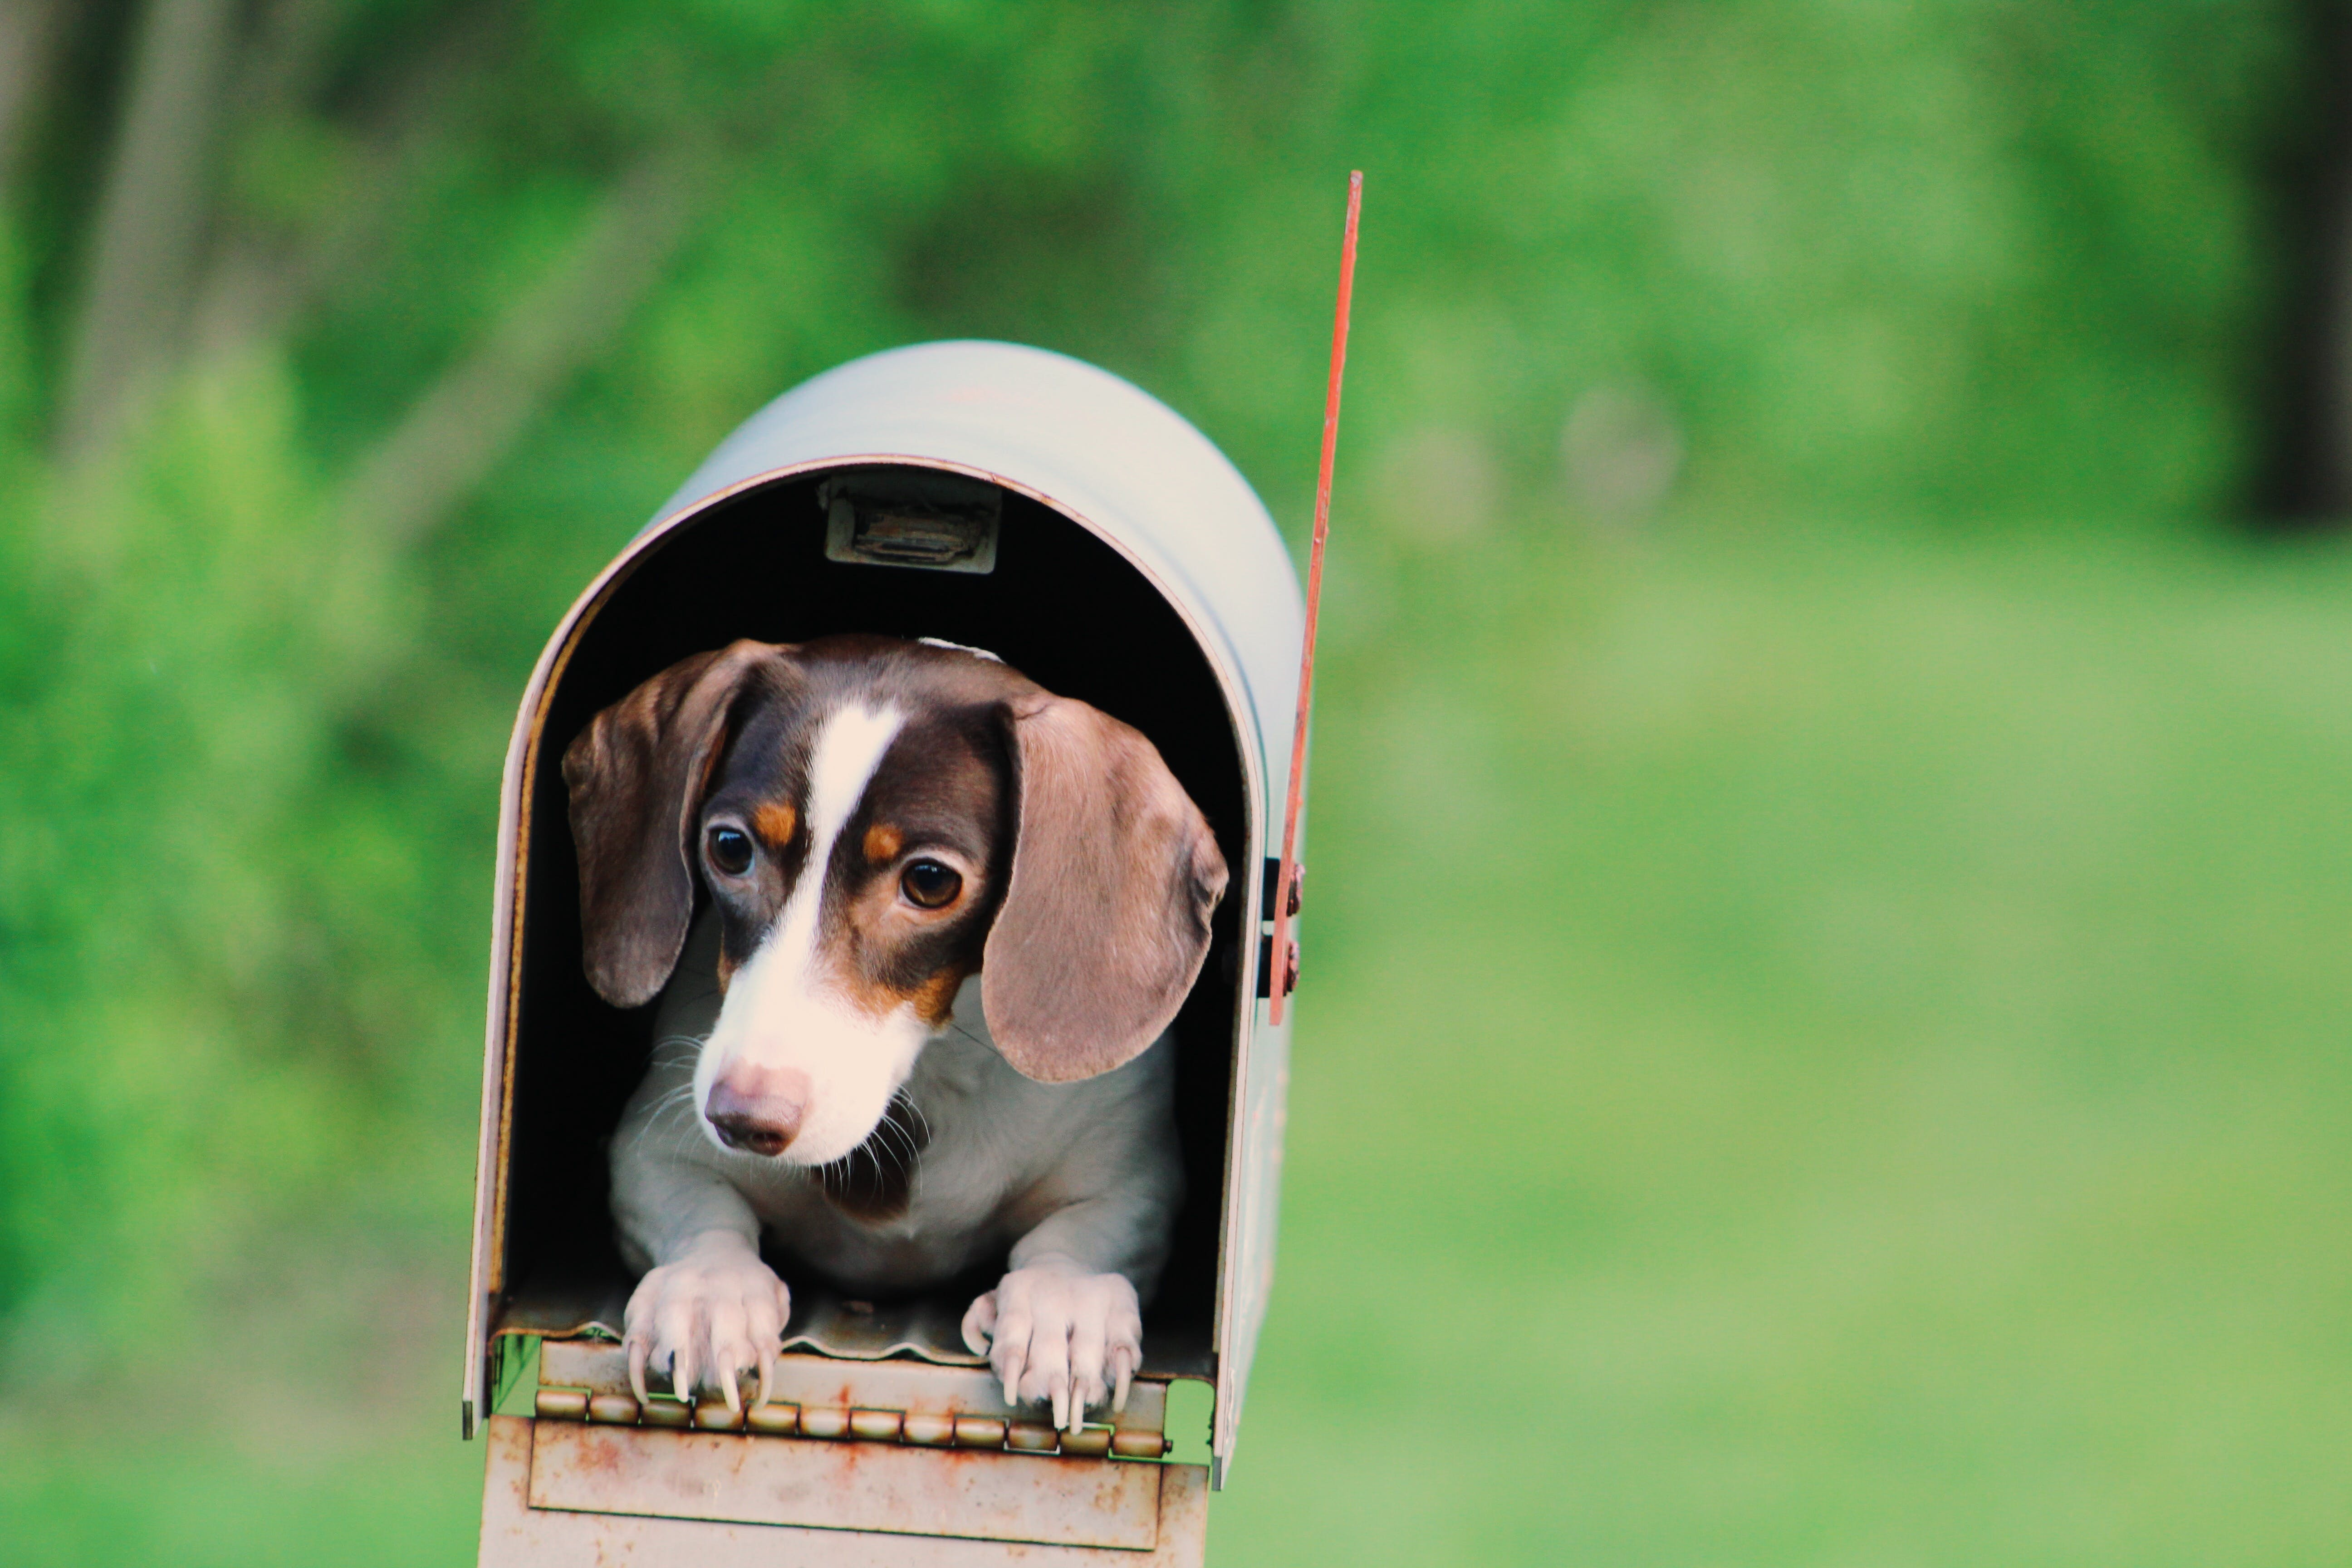 Gratis lagerfoto af dyr, hund, husdyr, hvalp